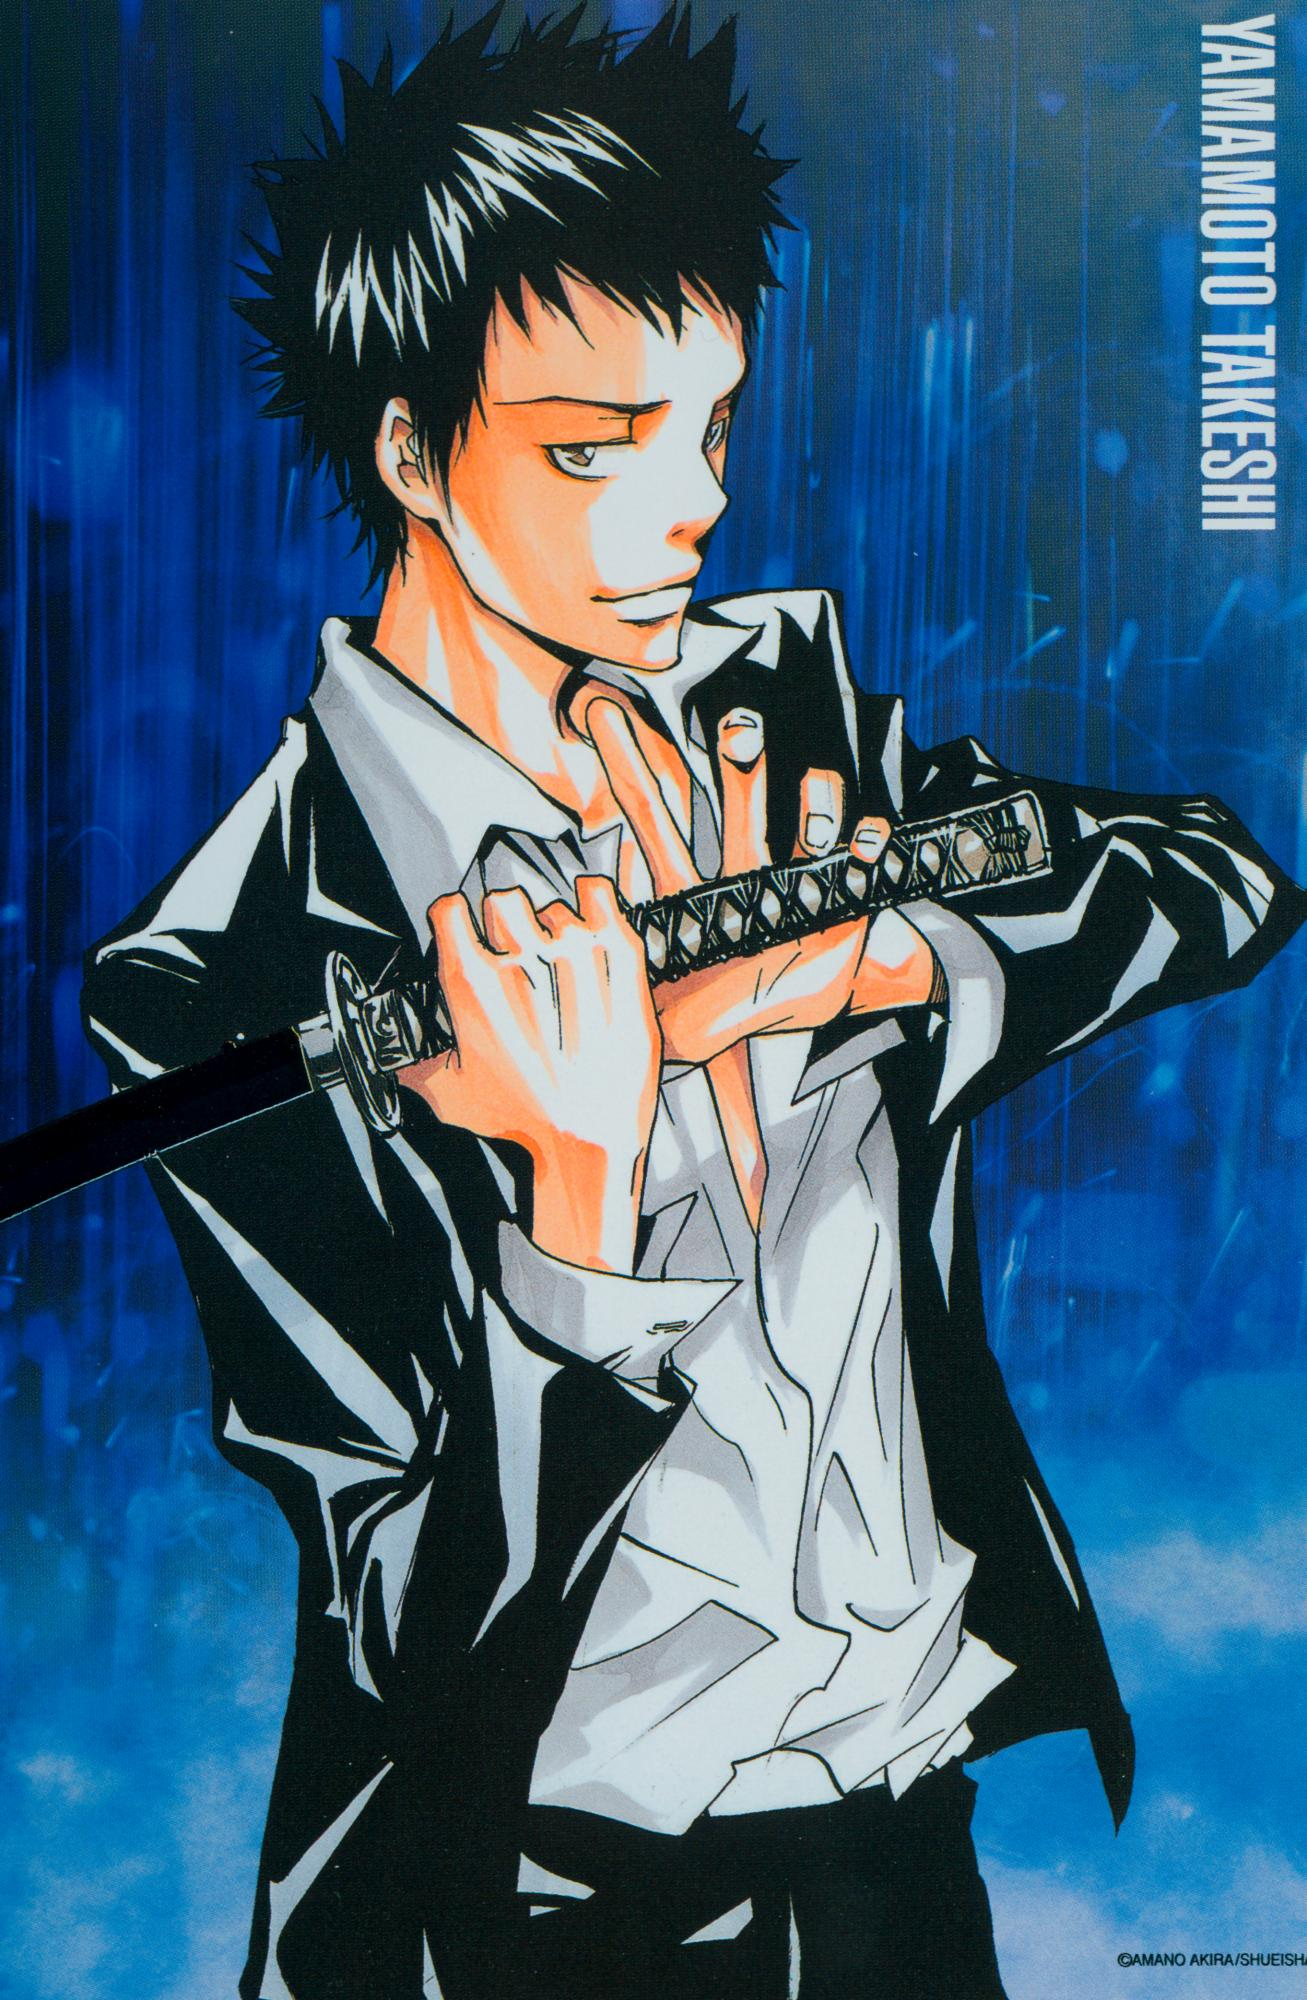 Katekyo Hitman Reborn!: KHR - Takeshi Yamamoto - Minitokyo